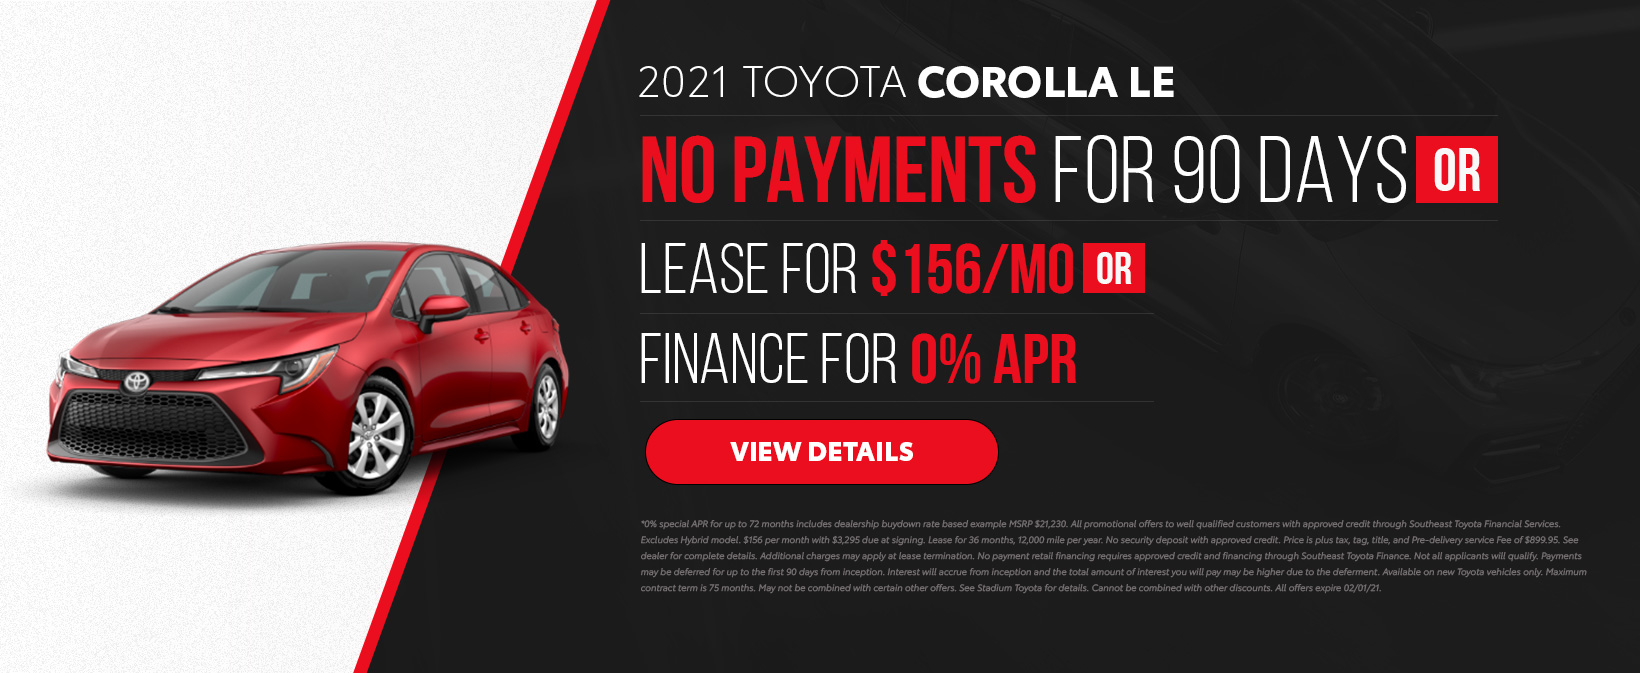 2021 Toyota Corolla Offers in Tampa, FL